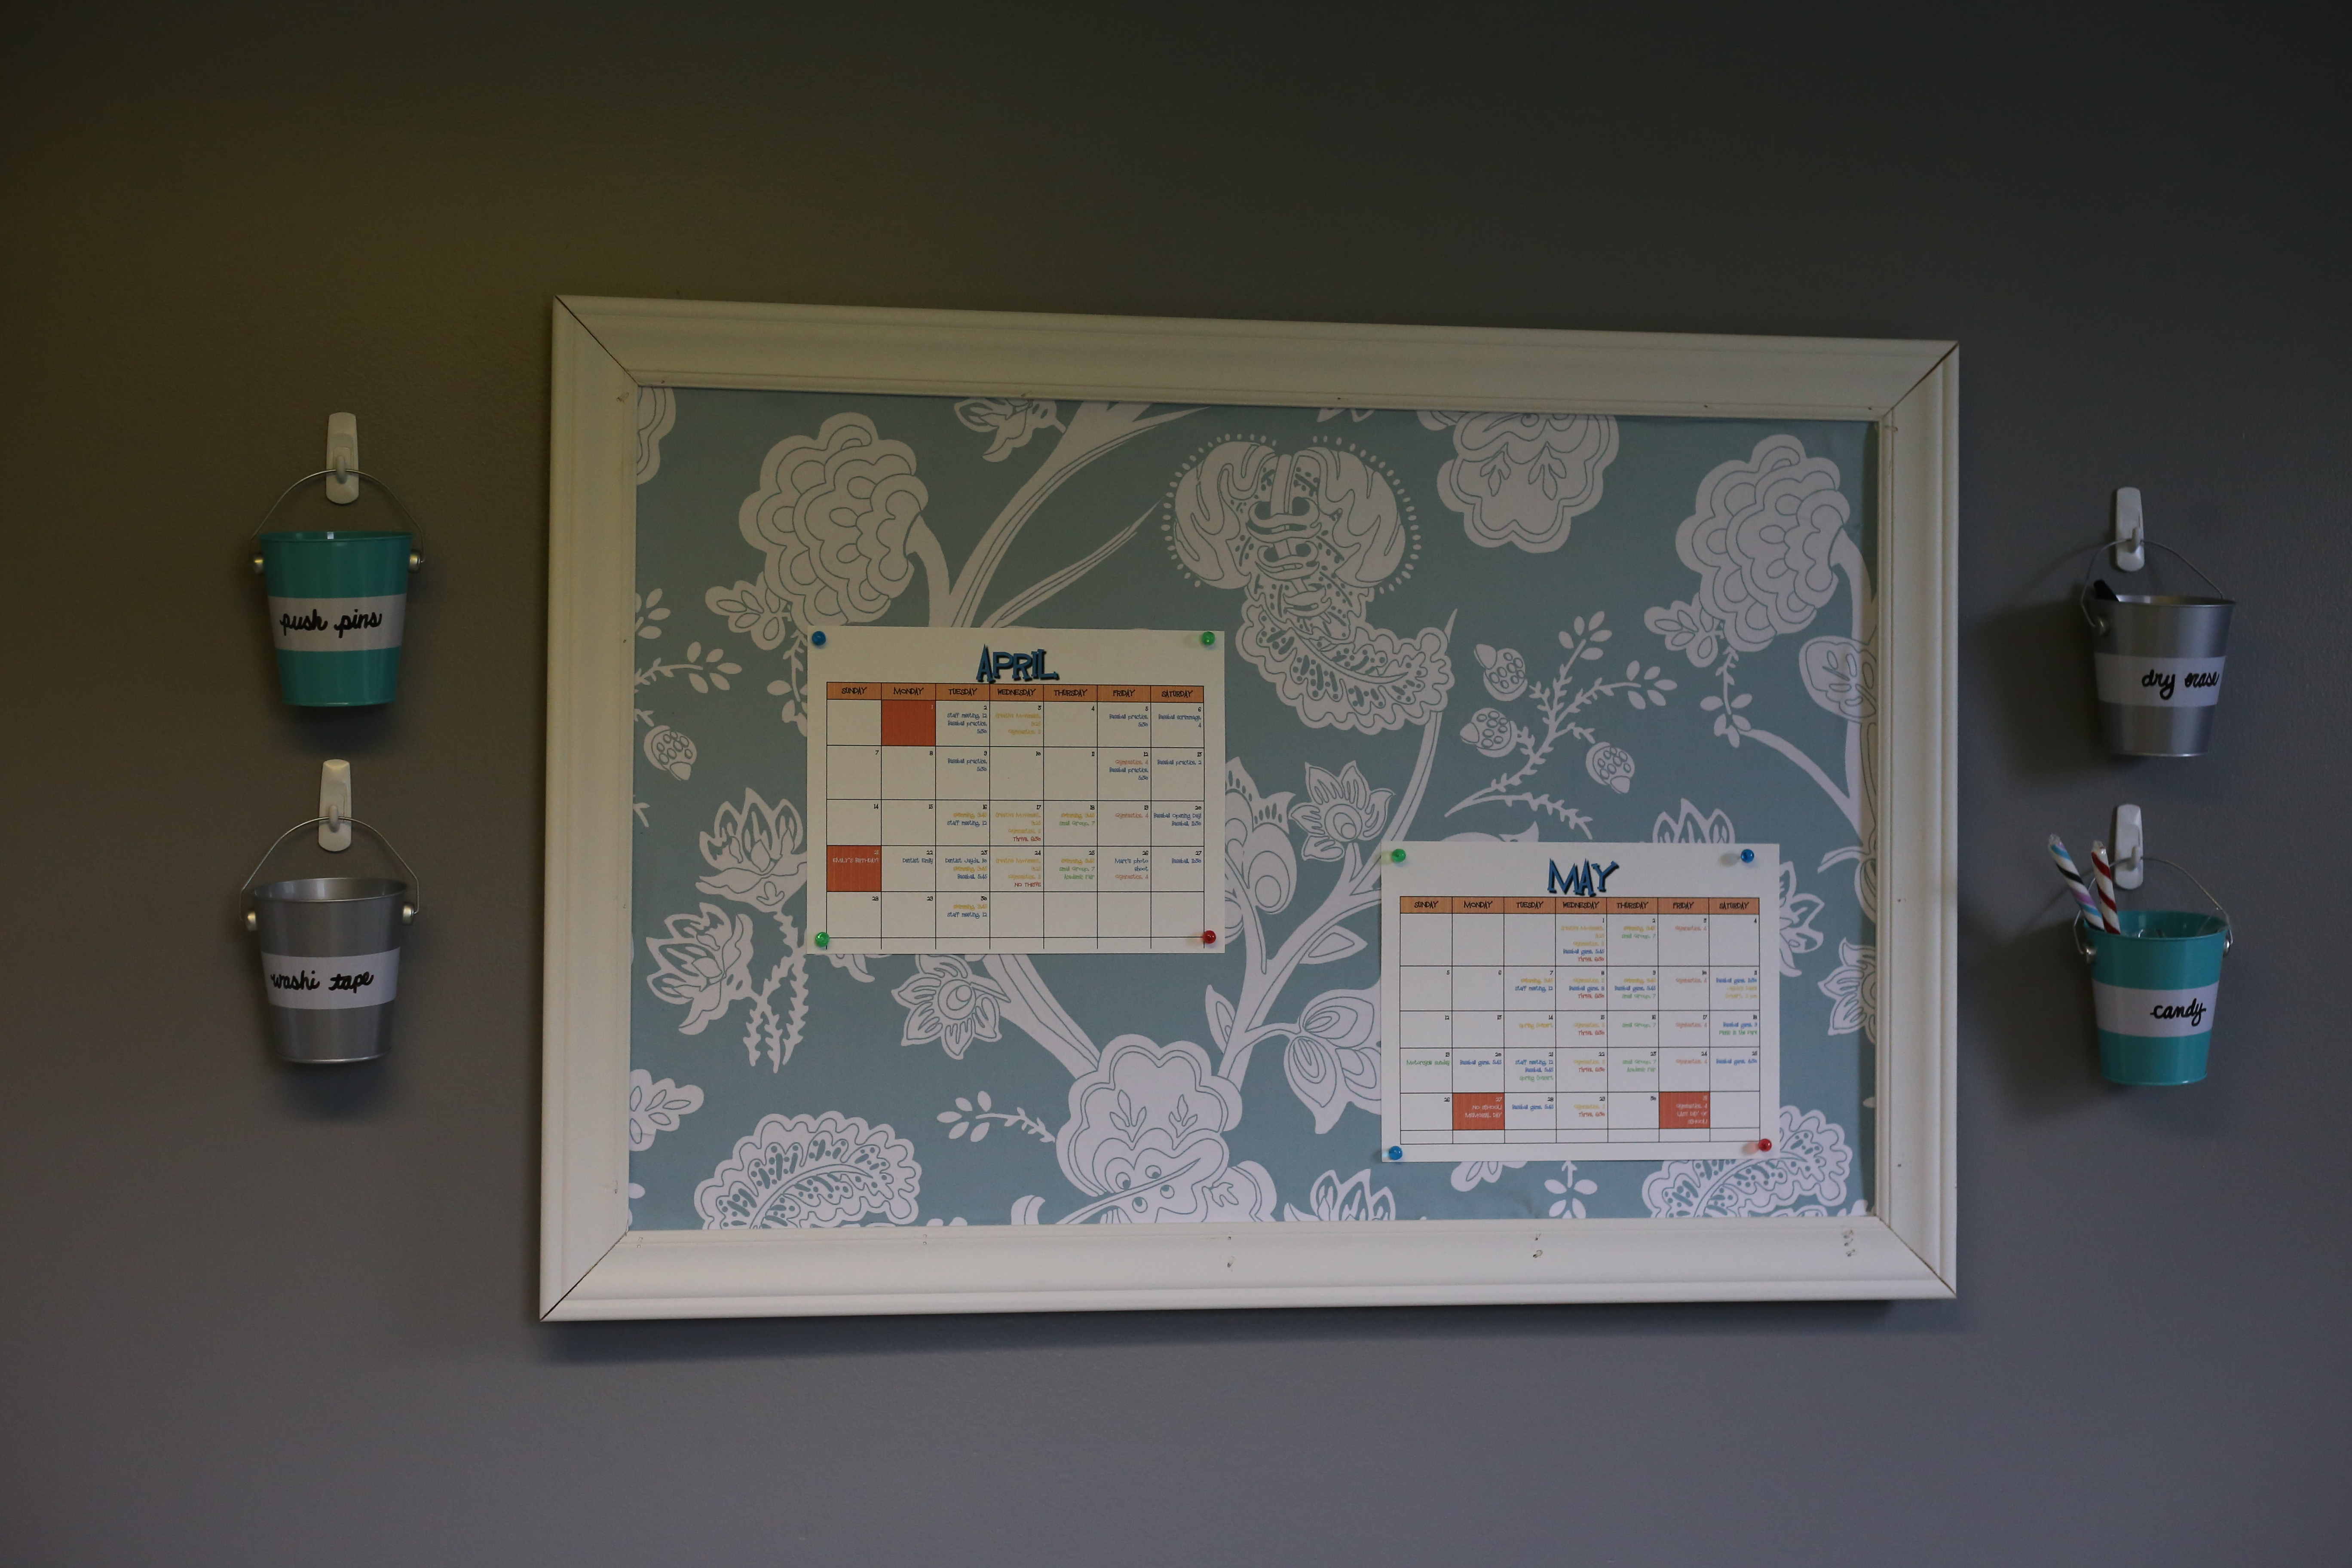 Getting cozi with my calendar